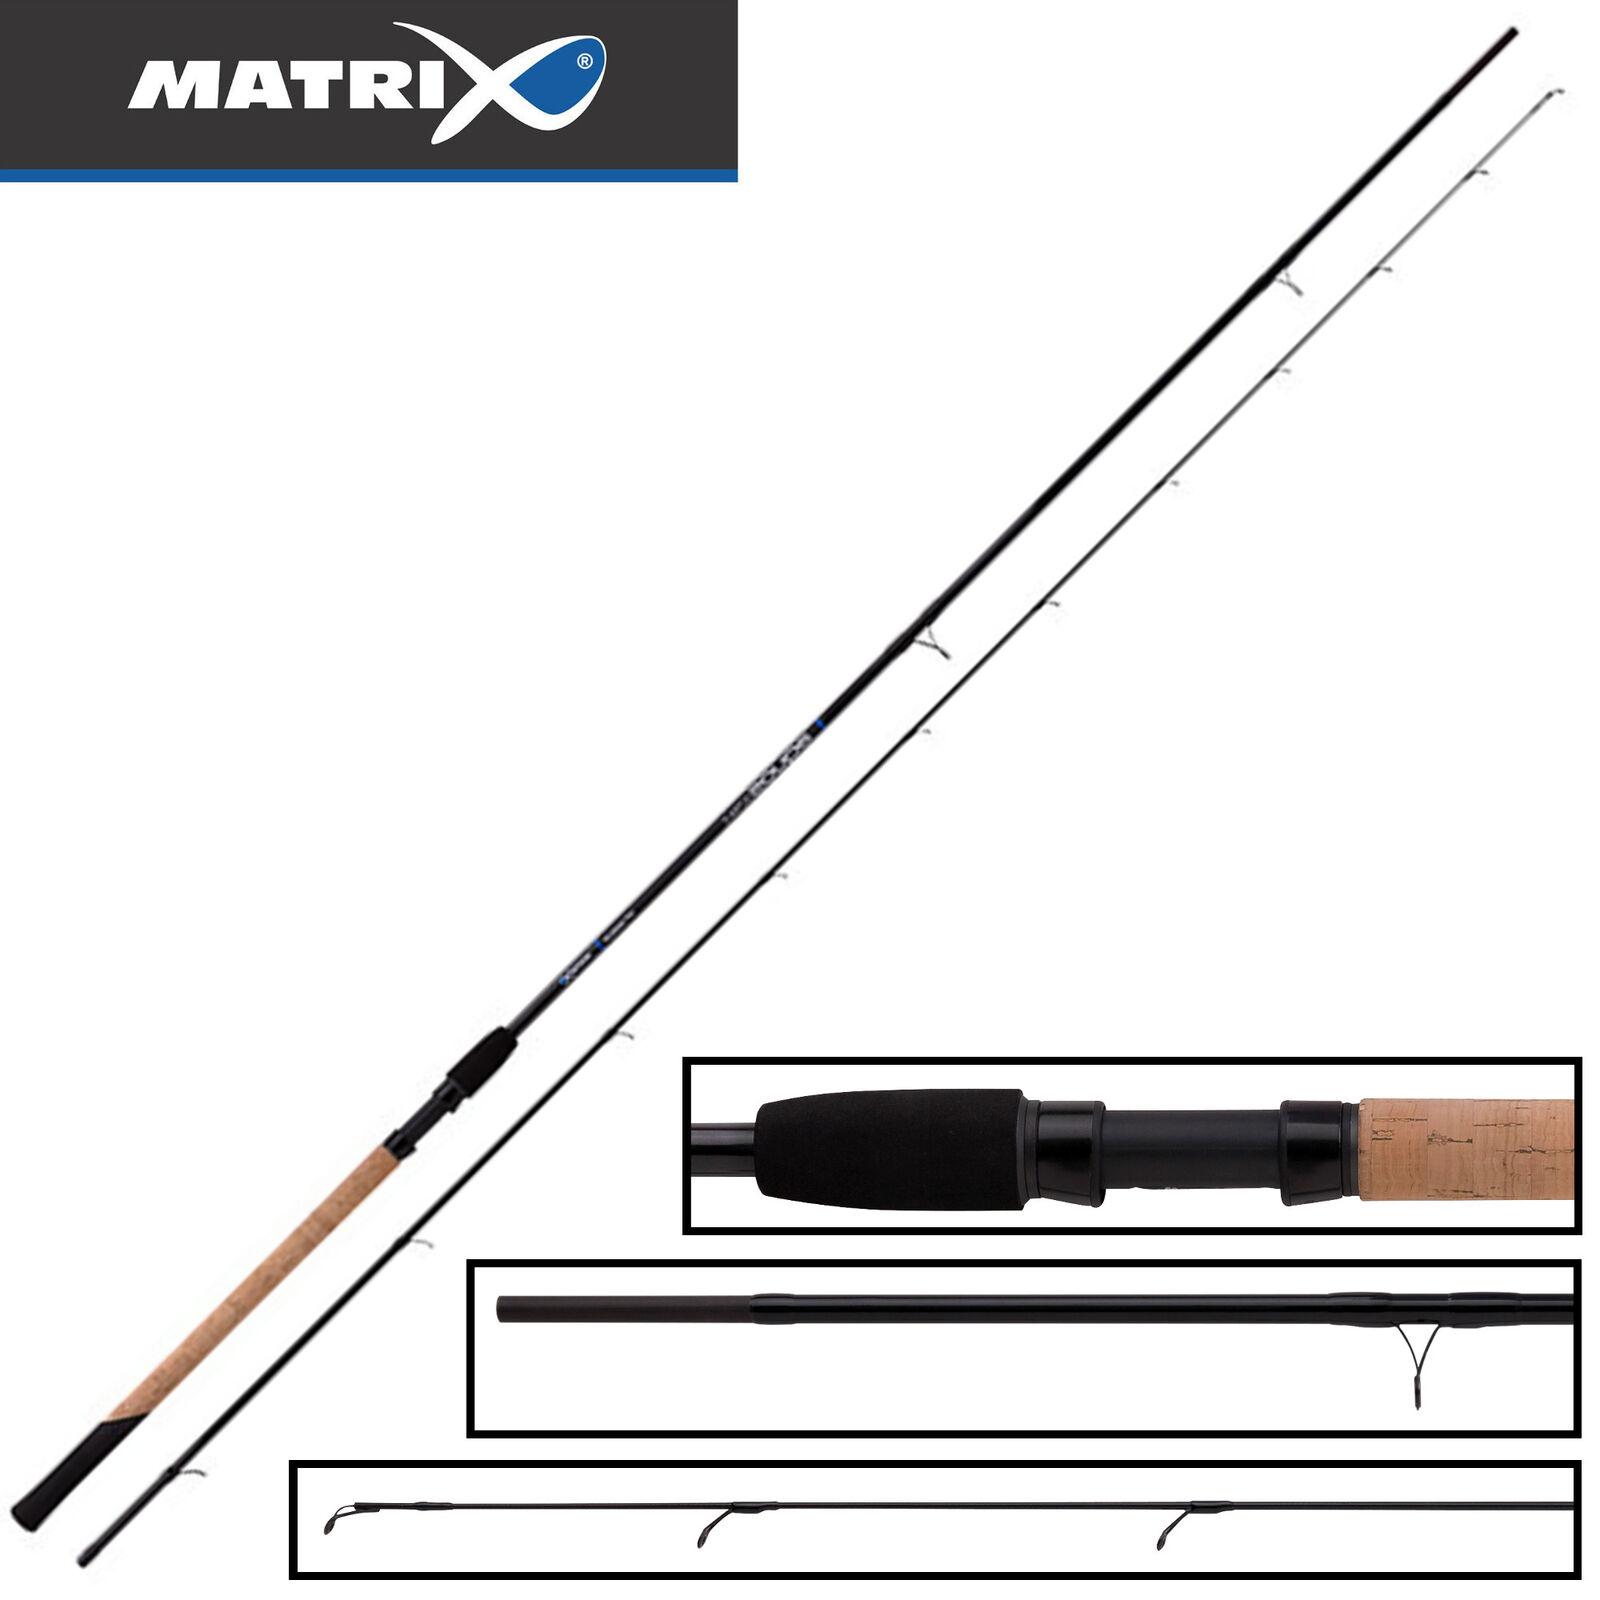 Fox Matrix Aquos Ultra C Waggler Rod 3 30m 25g - Matchrute Posenrute Angelrute